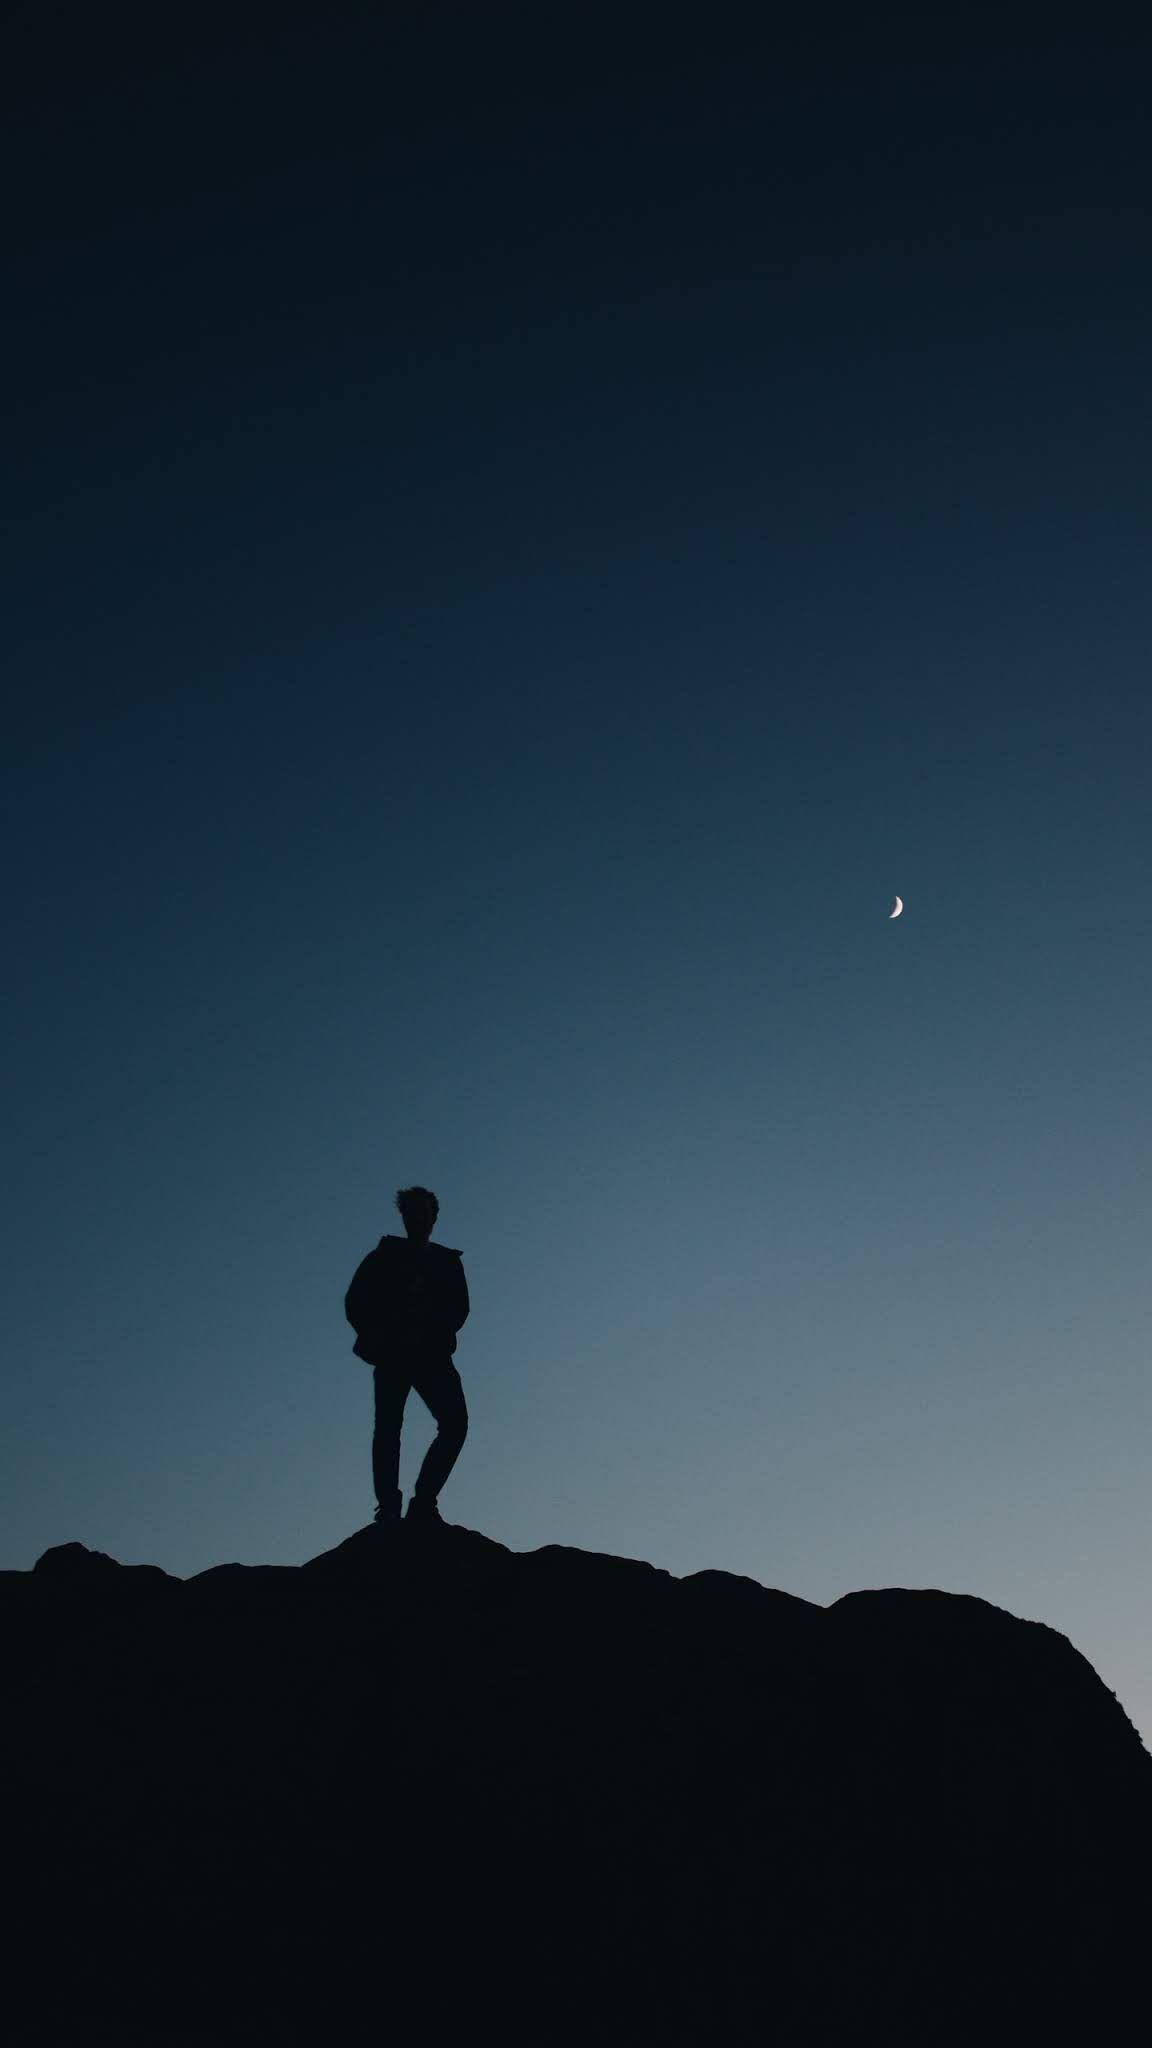 Adventure climb,mobile wallpaper,dark,sky,travel,hill